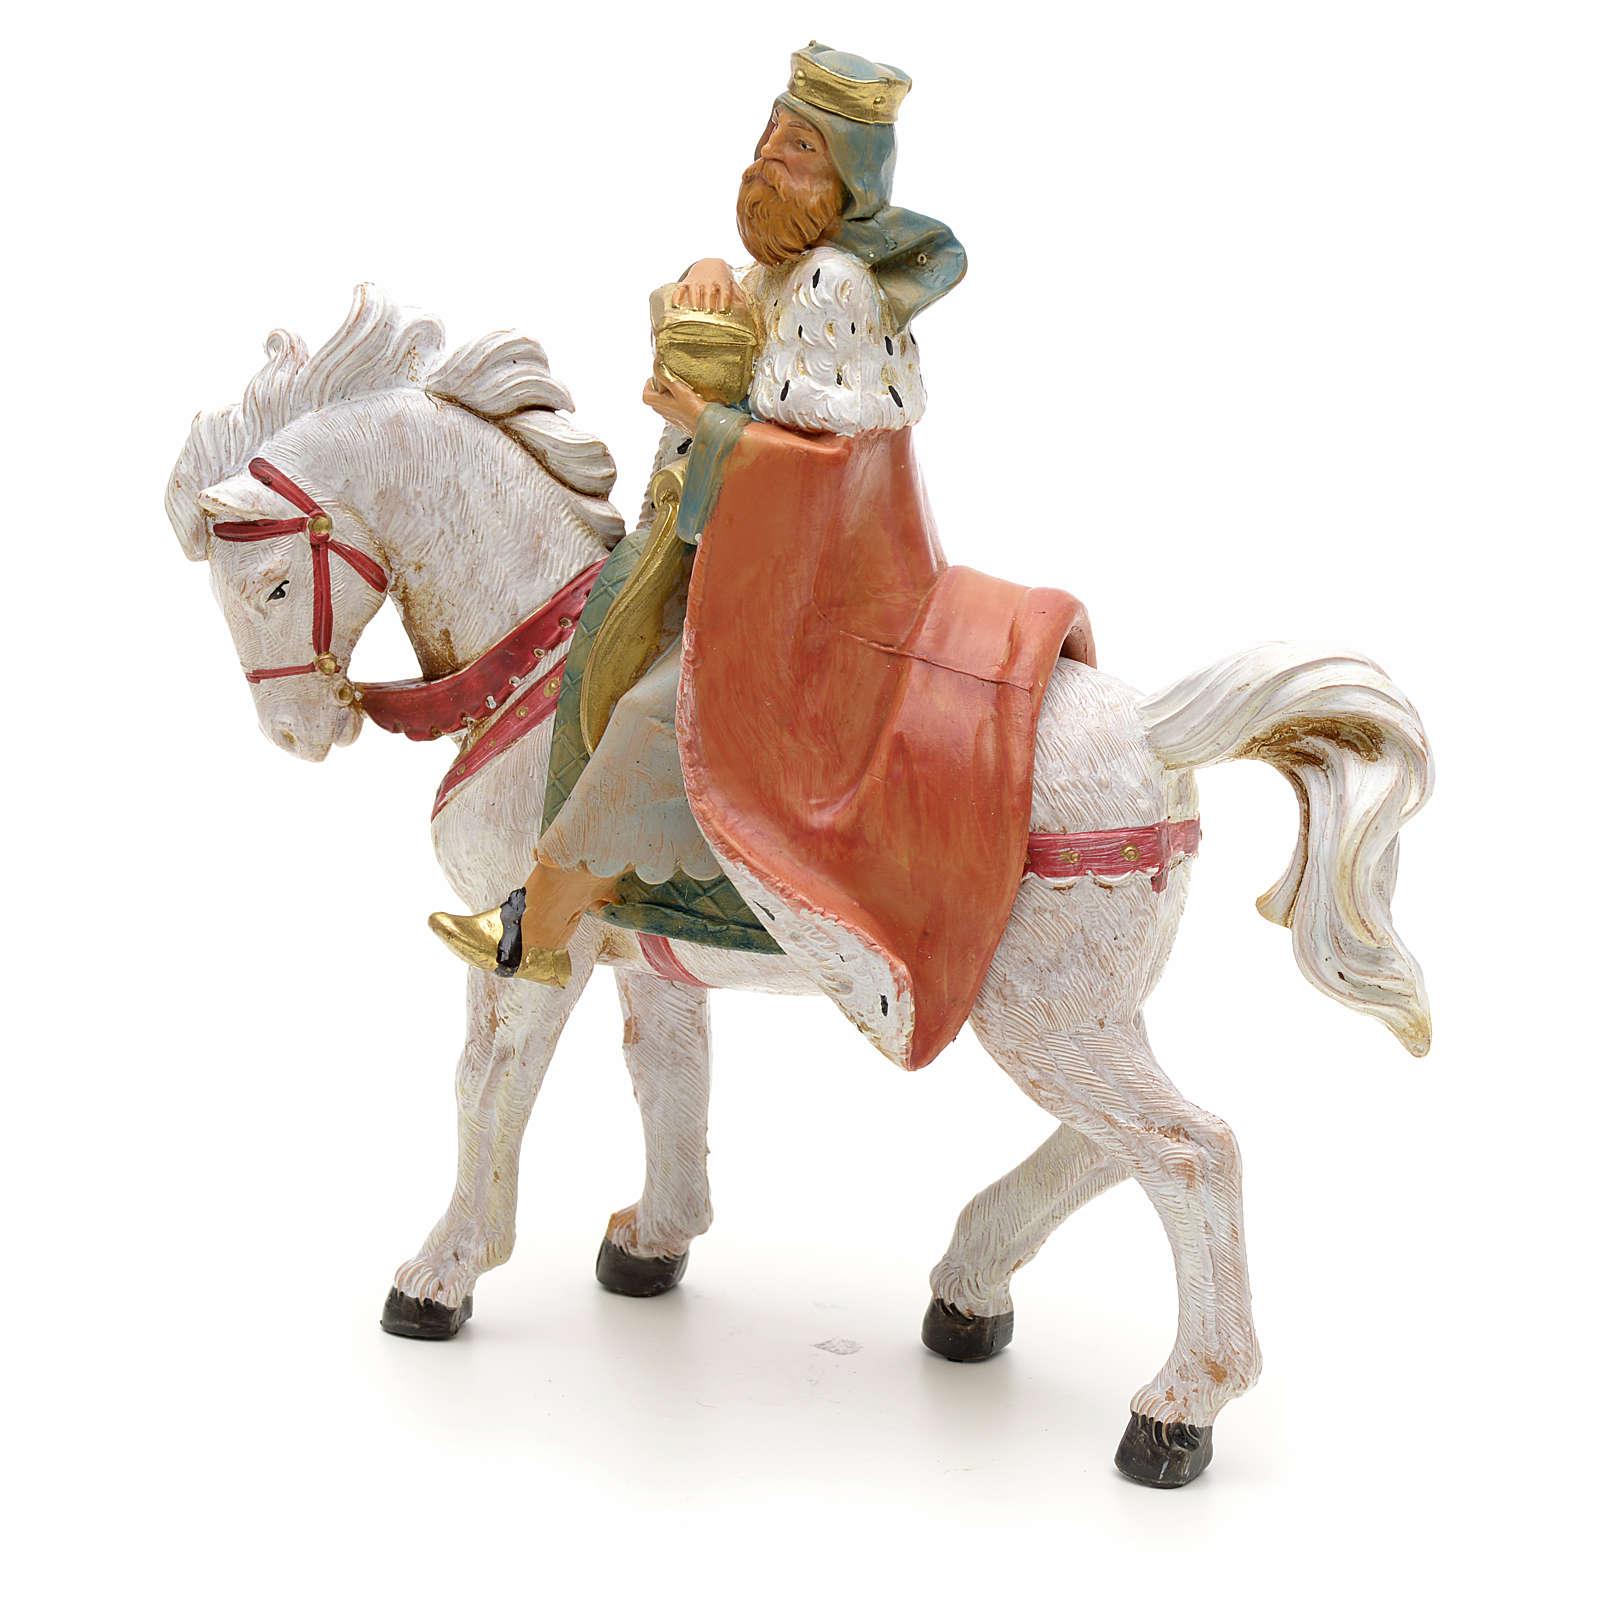 handcolorierter heiliger König zu Pferd, 12 cm Fontanini 4